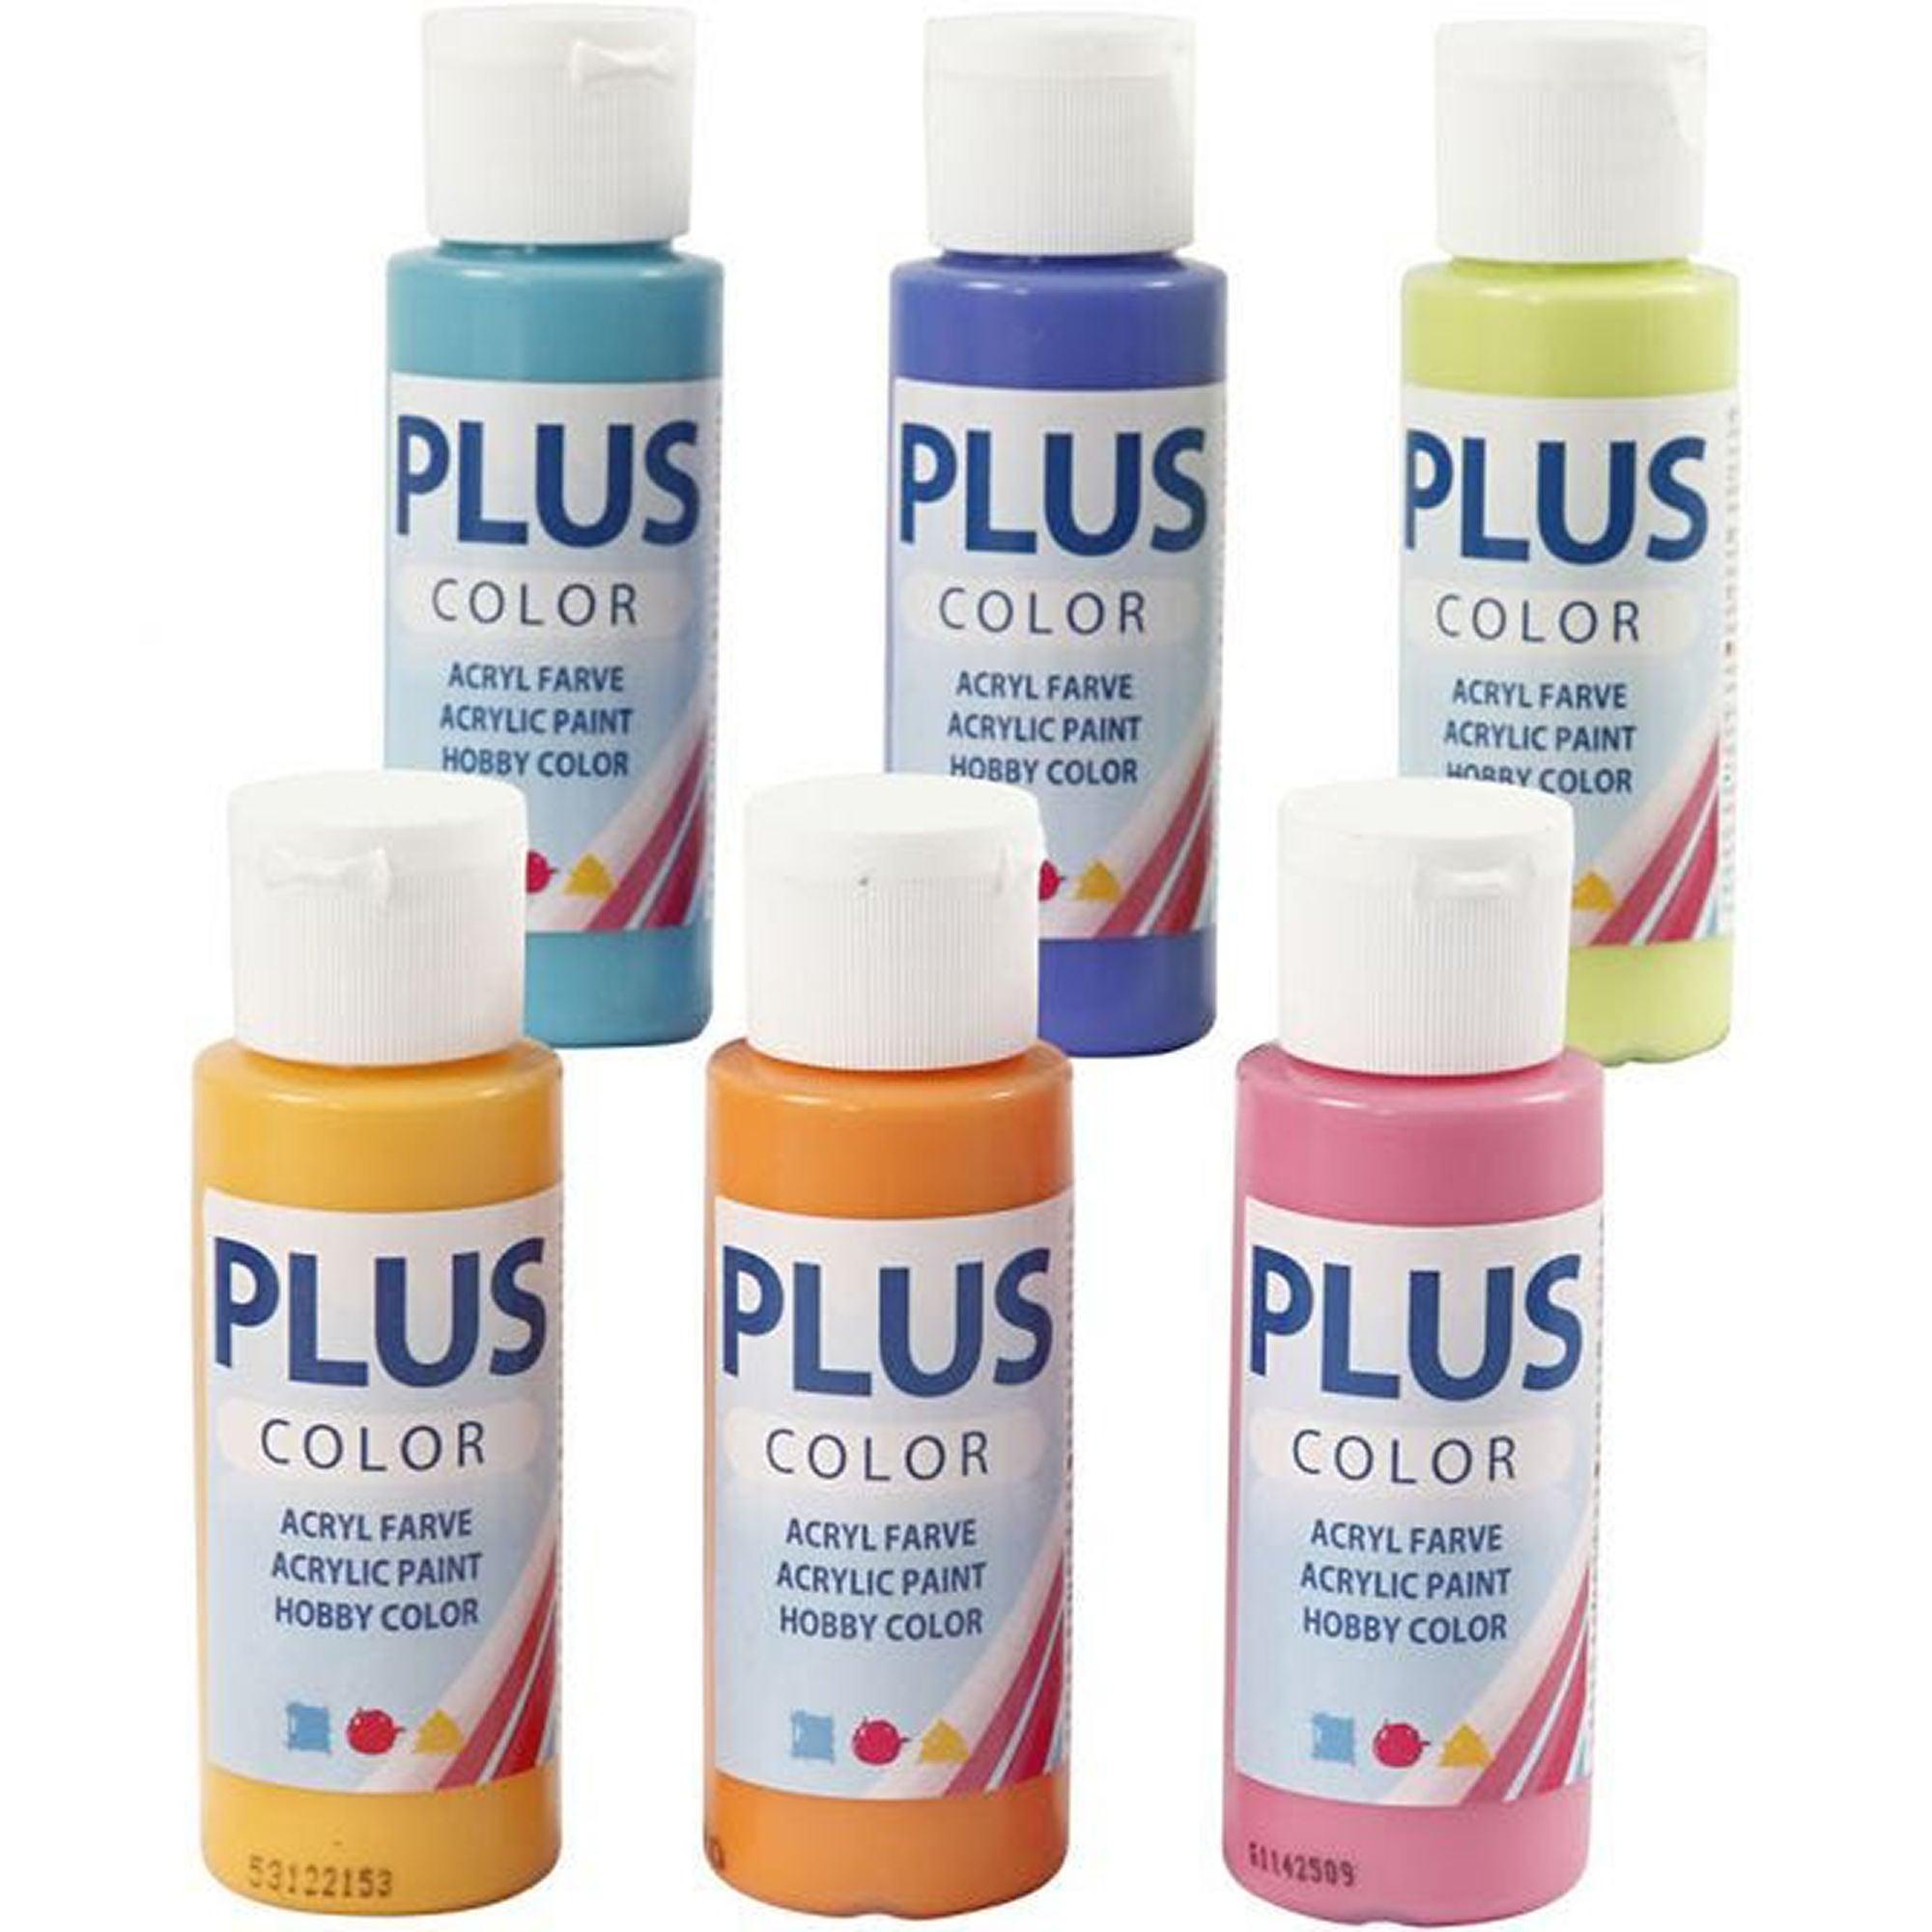 Plus Color Hobbyfärg Colorful